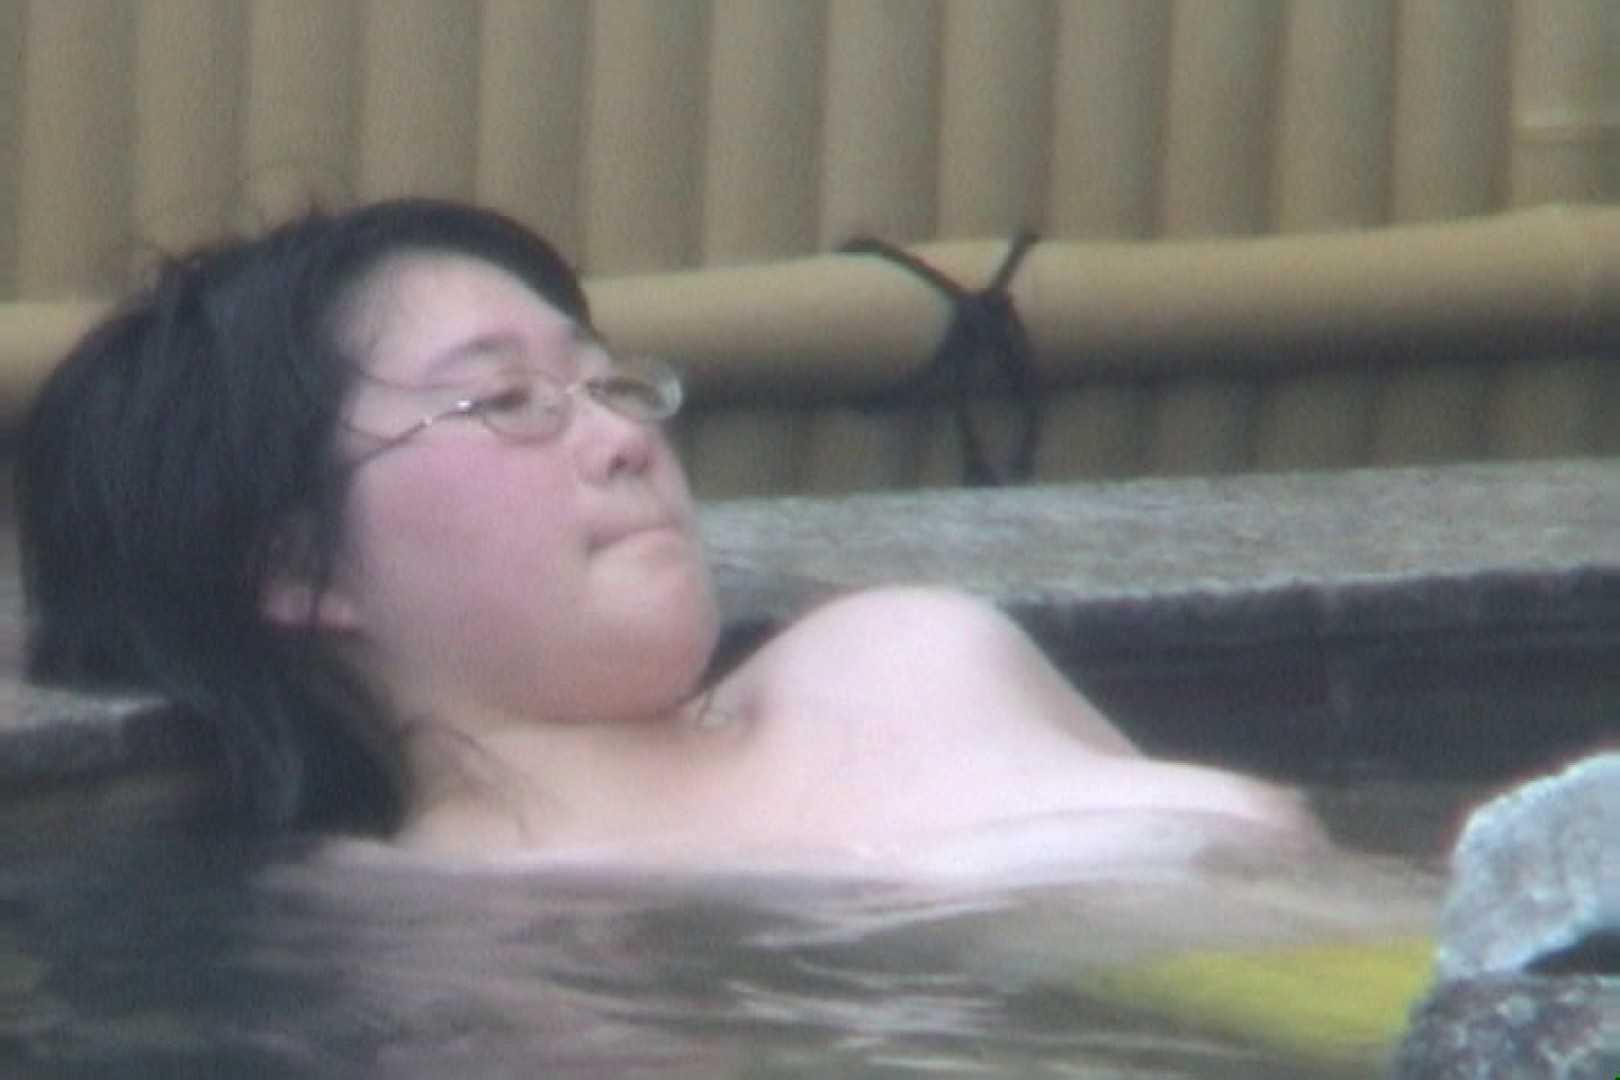 Aquaな露天風呂Vol.46【VIP限定】 女体盗撮  98連発 24